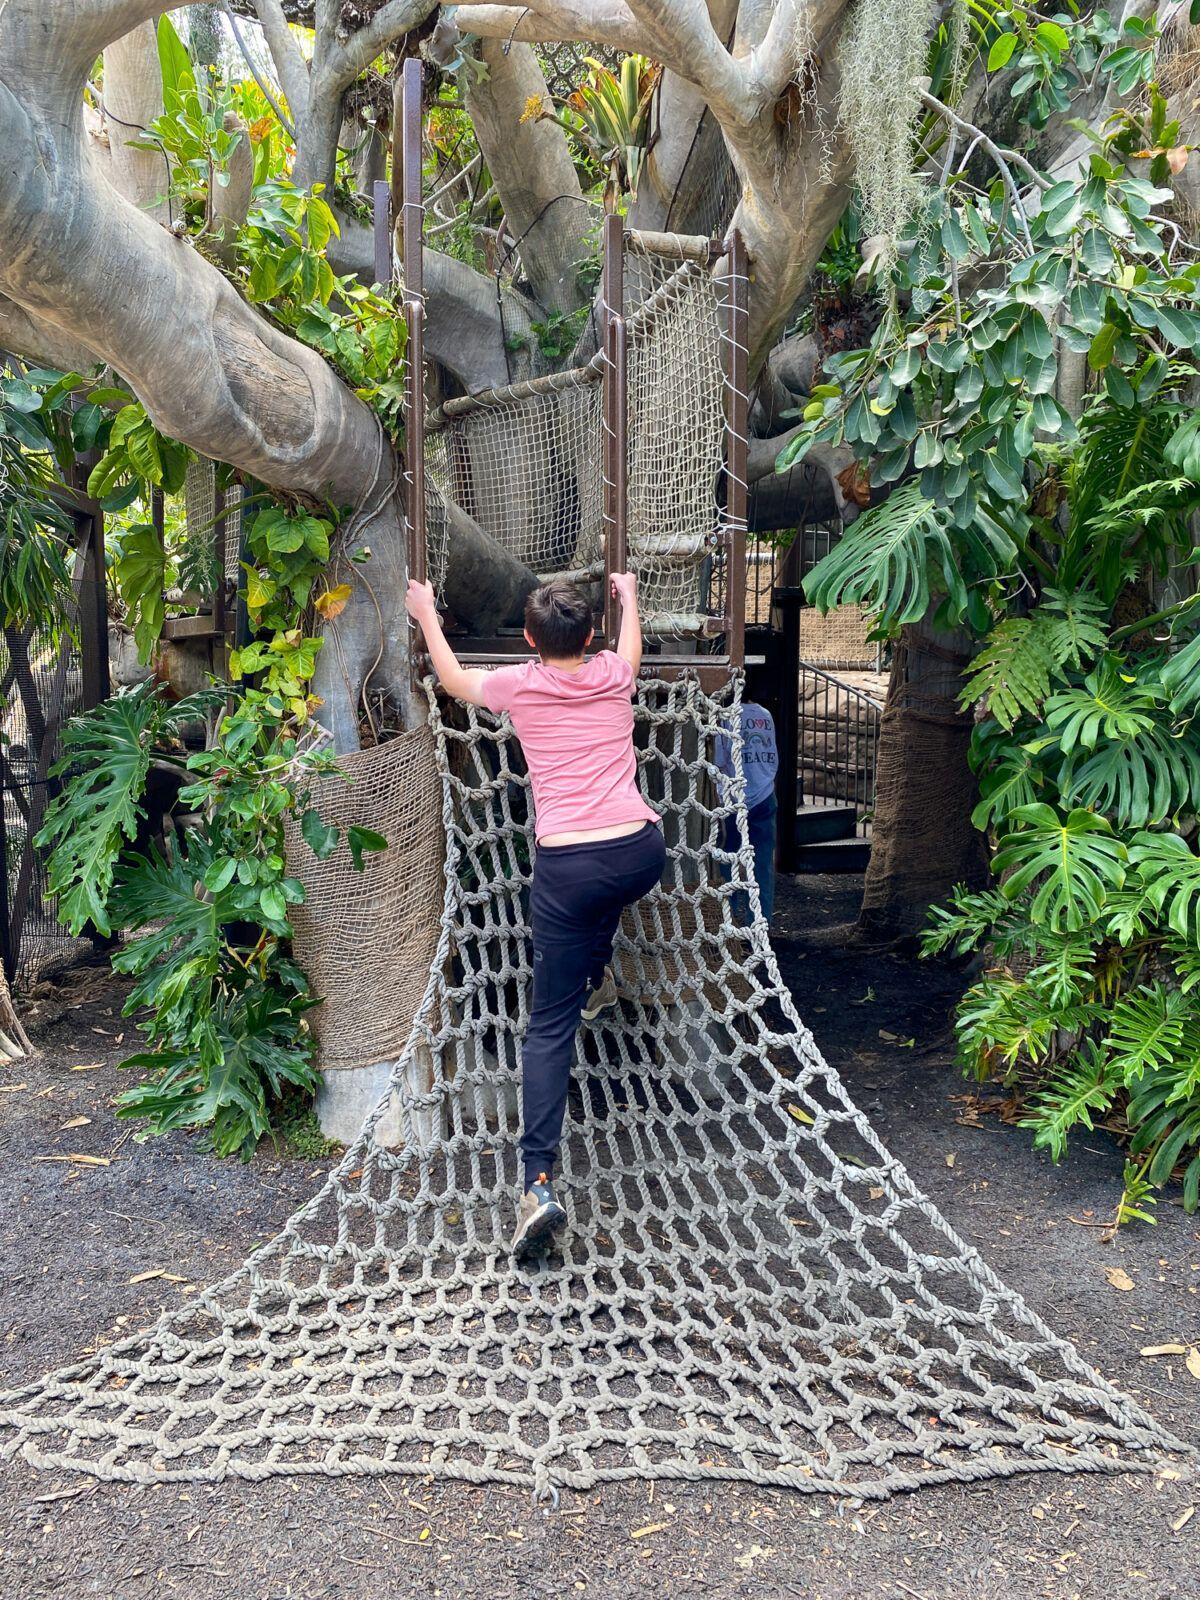 Young teen at Toni's Treehouse at San Diego Botanic Garden